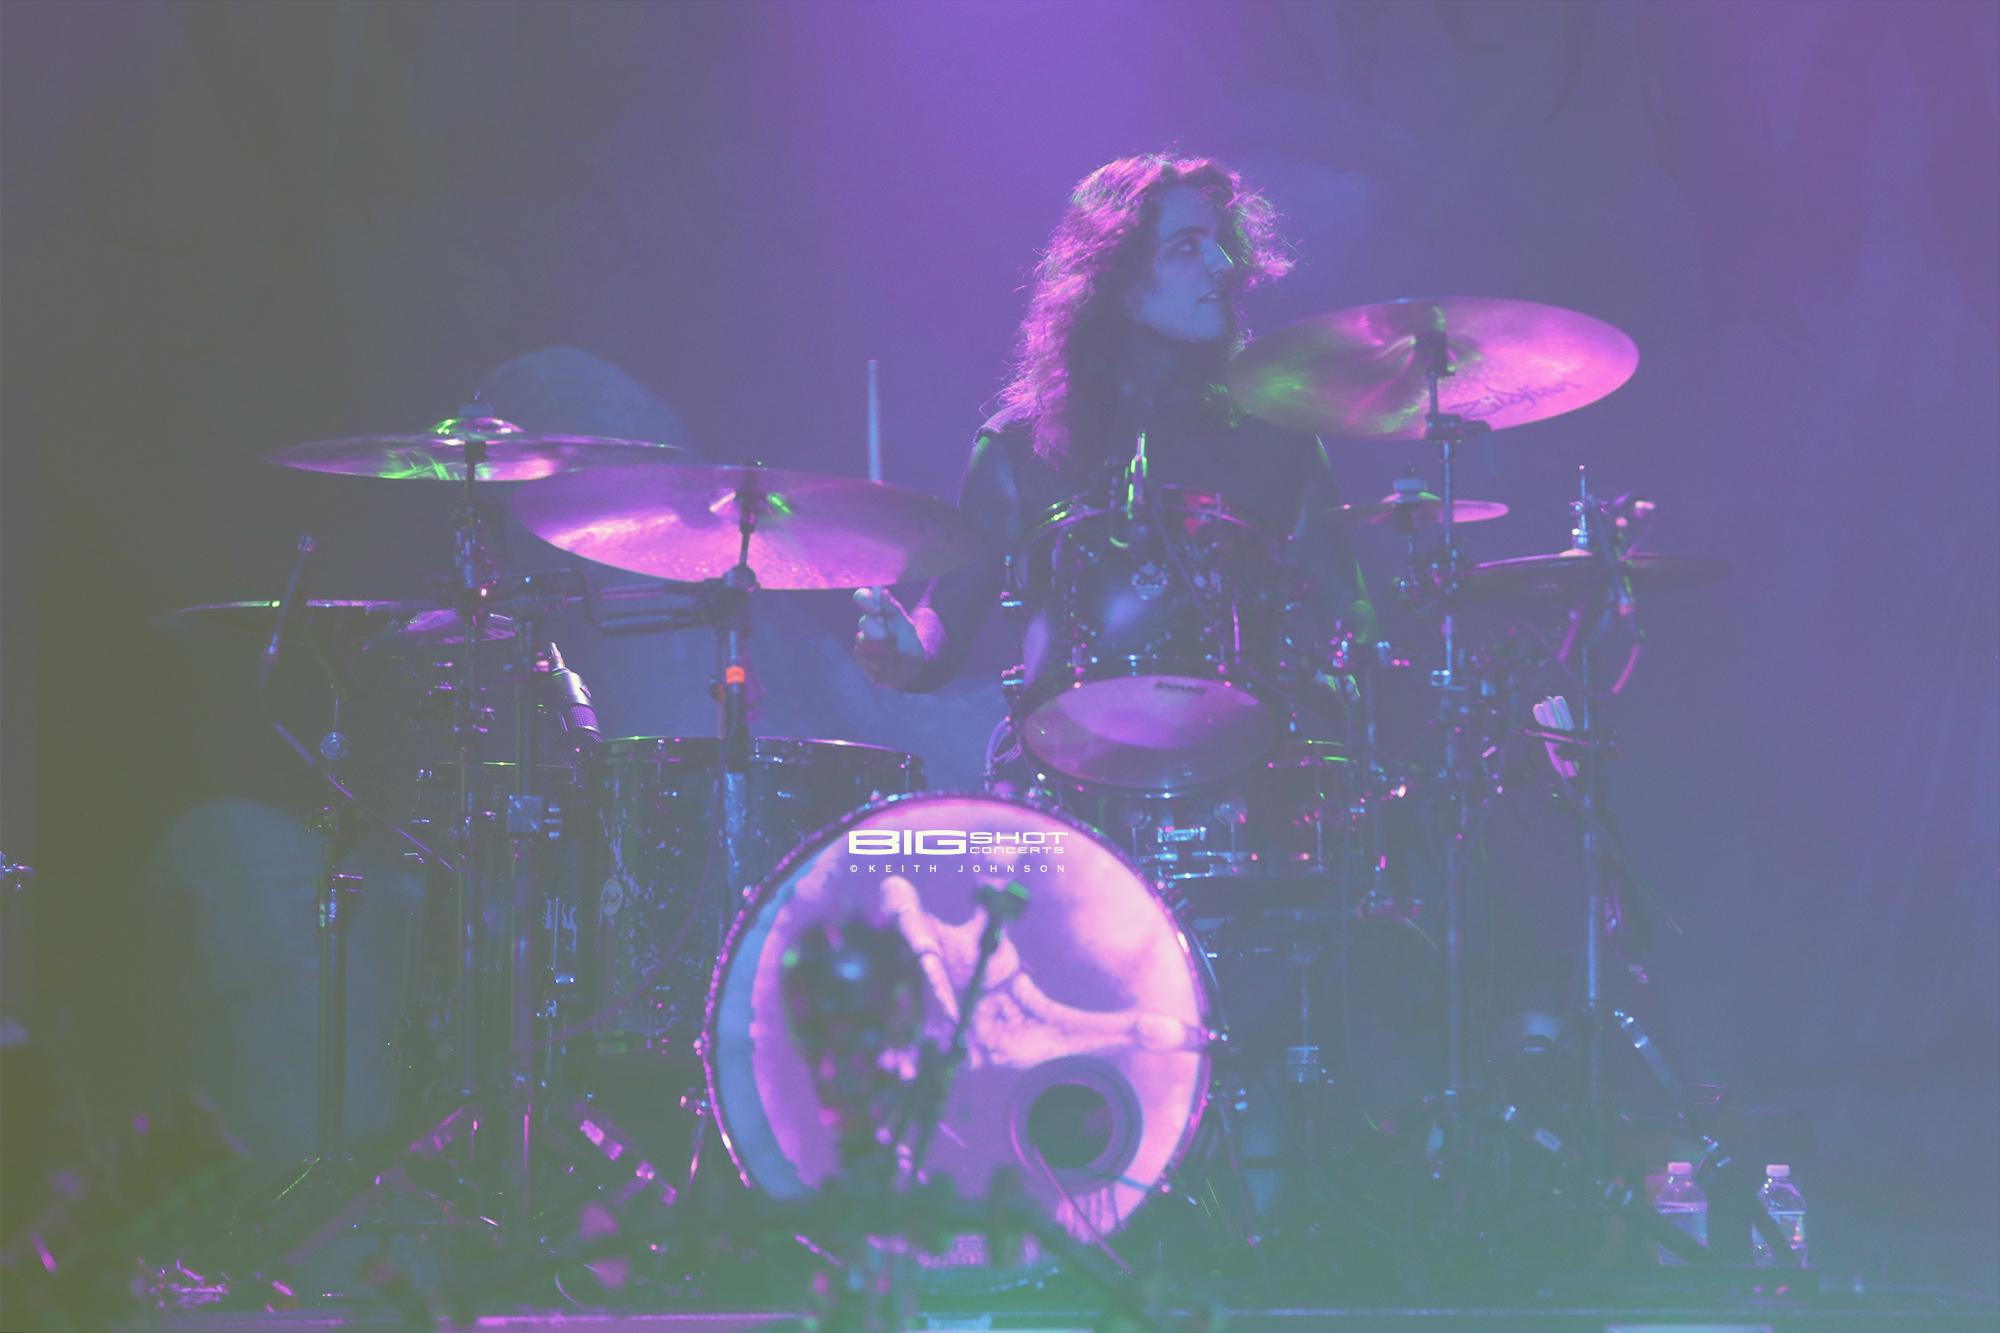 Drummer Vinny Mauro of Motionless in White